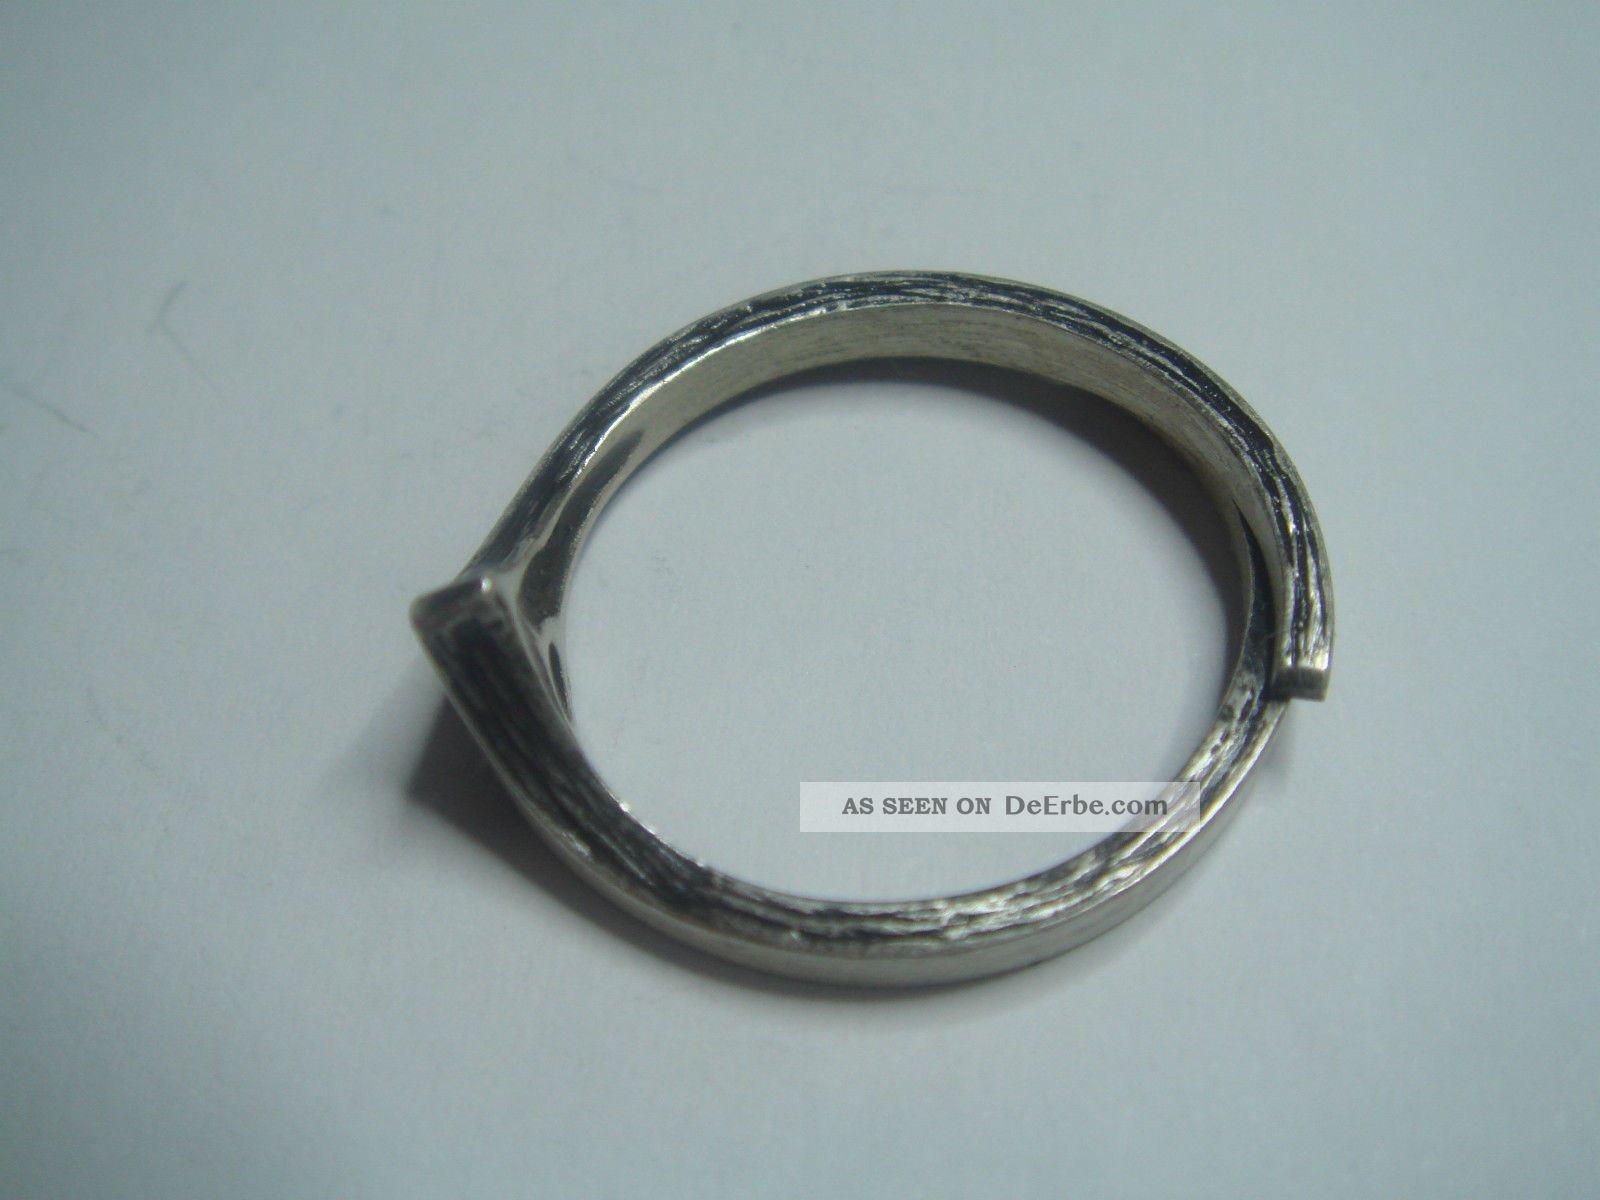 vintage ring von ninex korut oy finnland echt silber 925. Black Bedroom Furniture Sets. Home Design Ideas